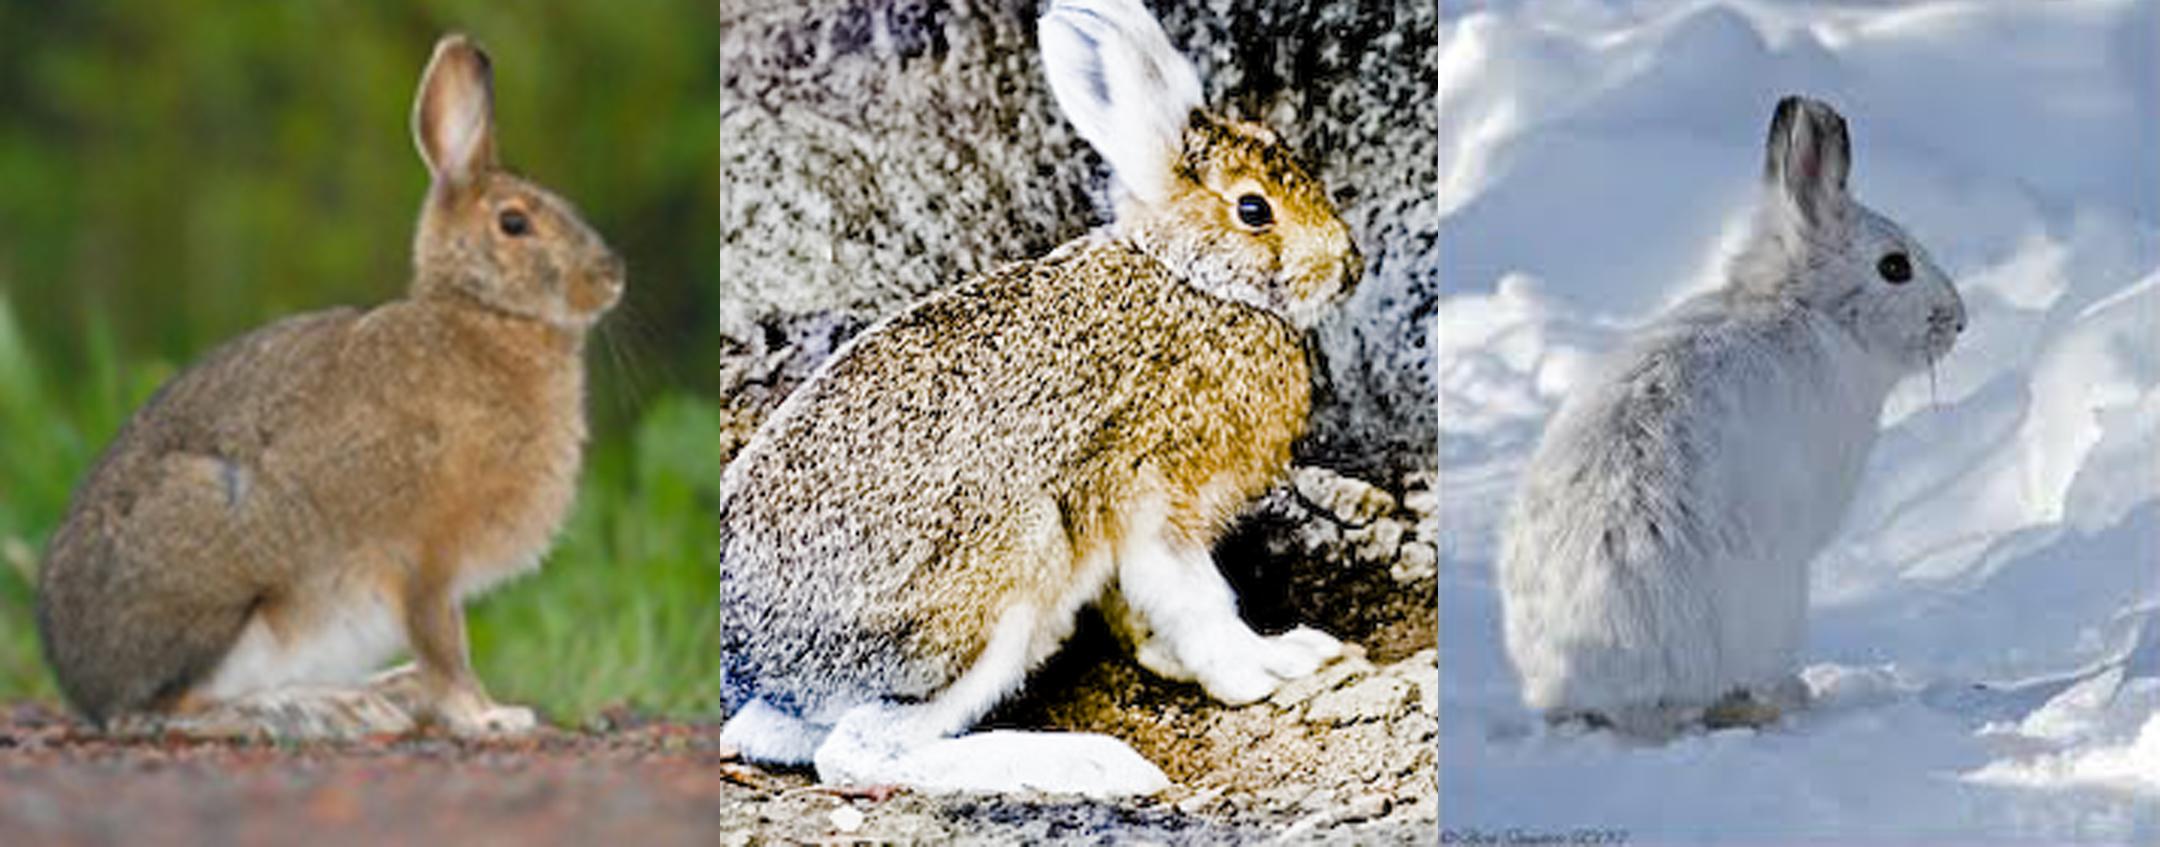 Biodiversity And Adaptations